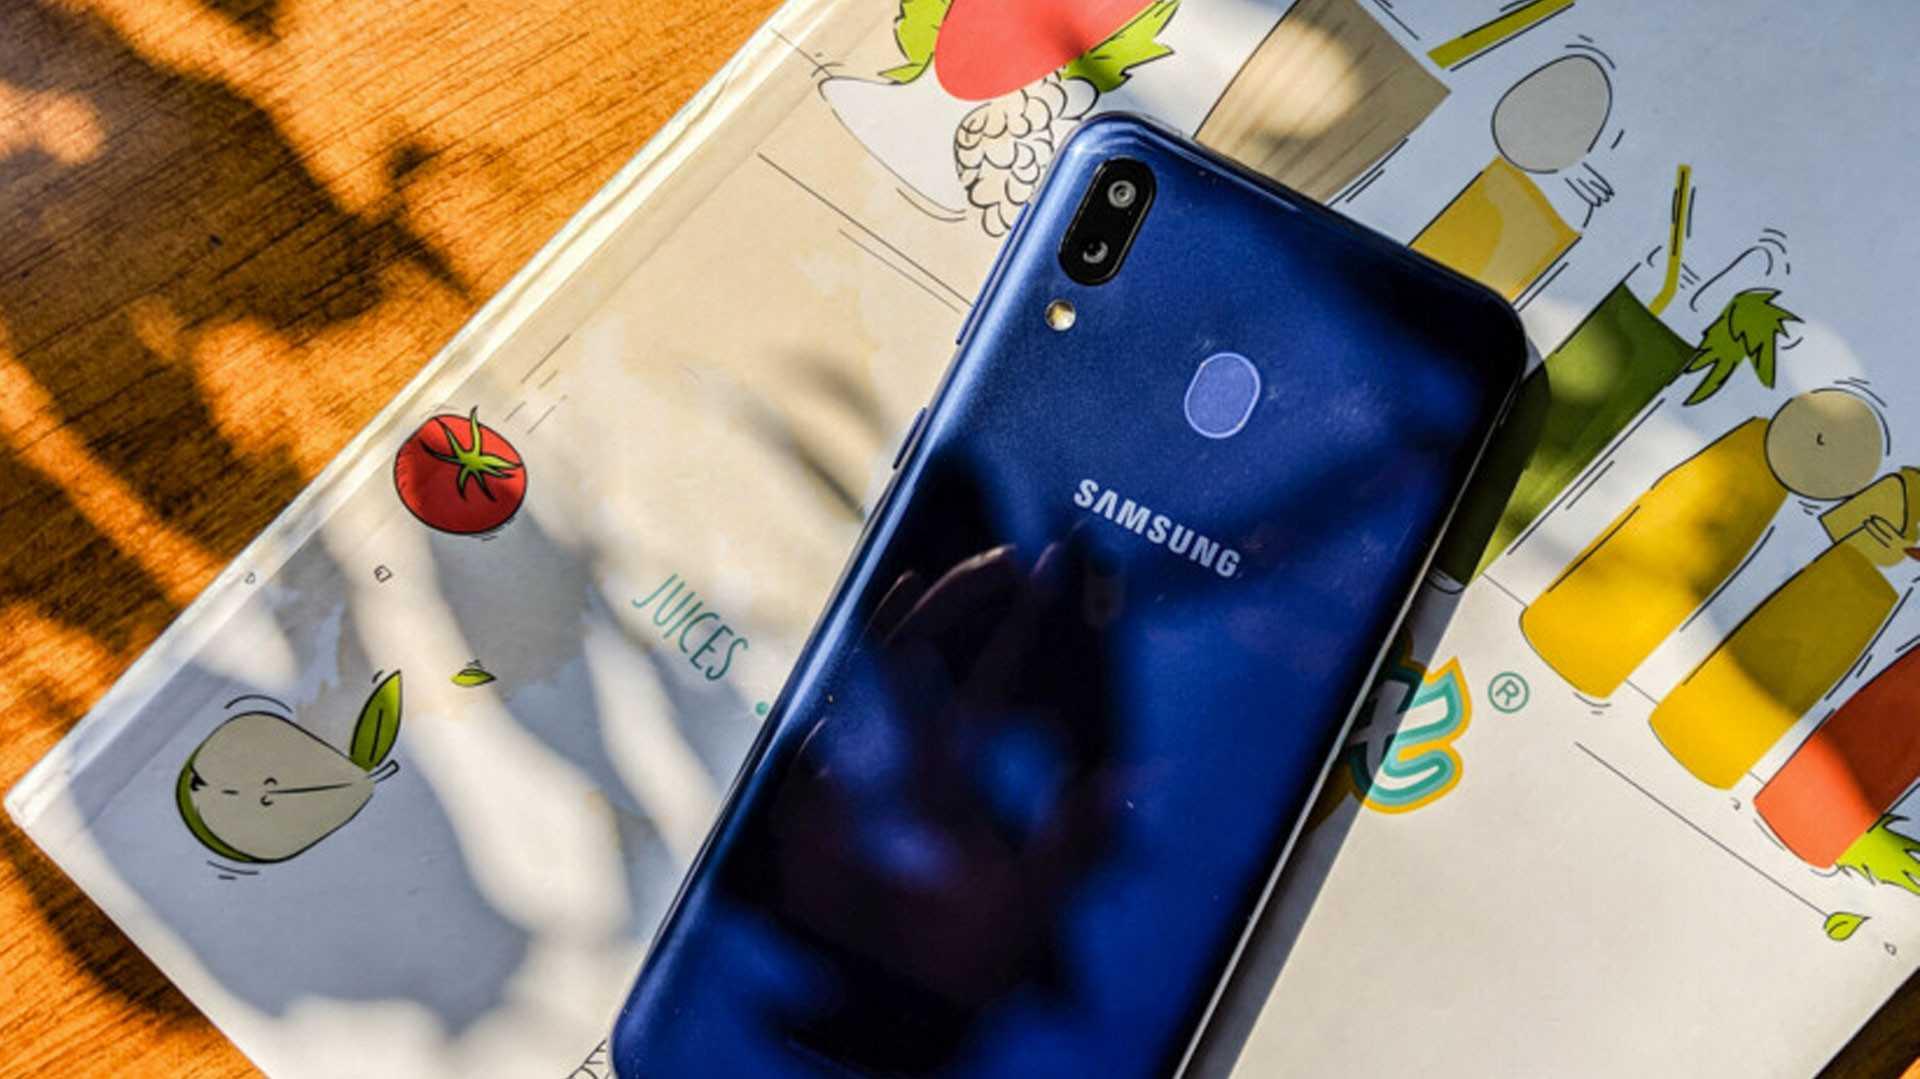 Android 10 наладит работу распознавания лиц на смартфонах samsung - androidinsider.ru